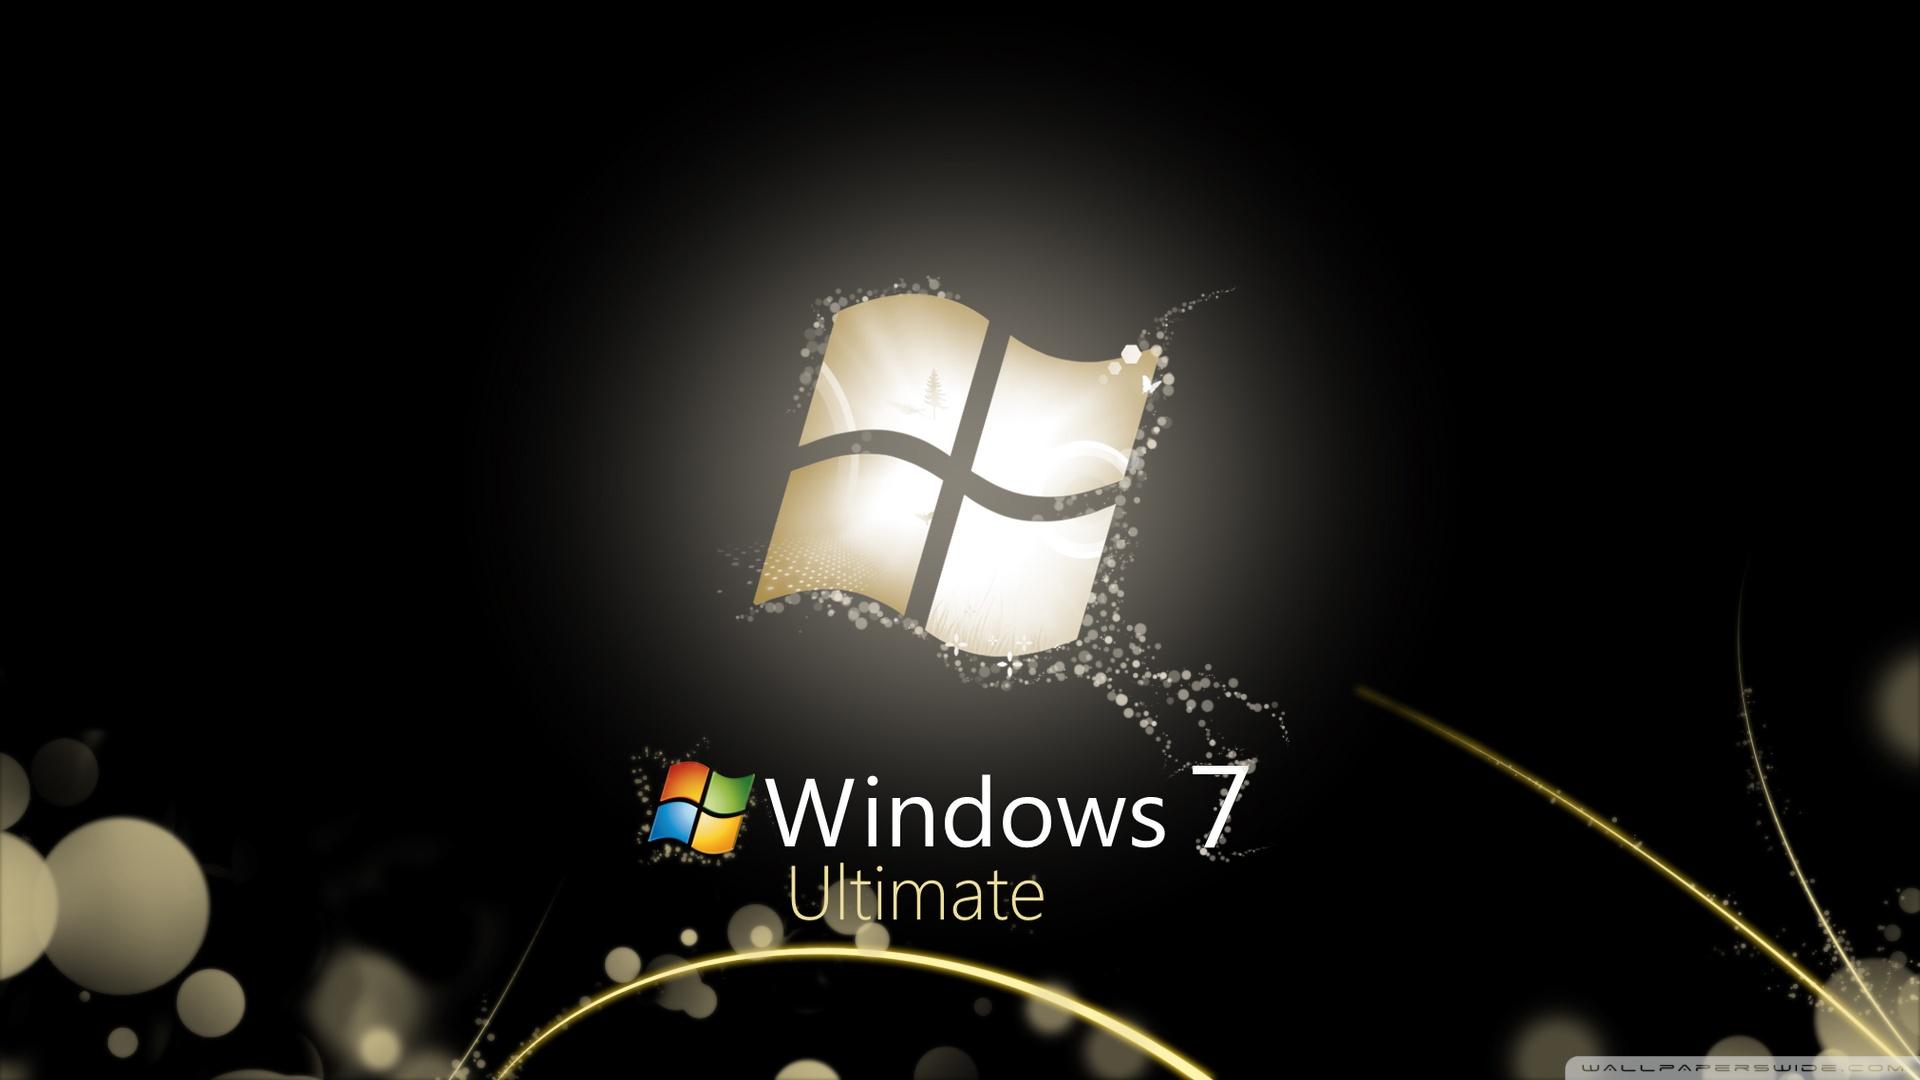 Windows 7 Ultimate Bright Black HD desktop wallpaper : Widescreen